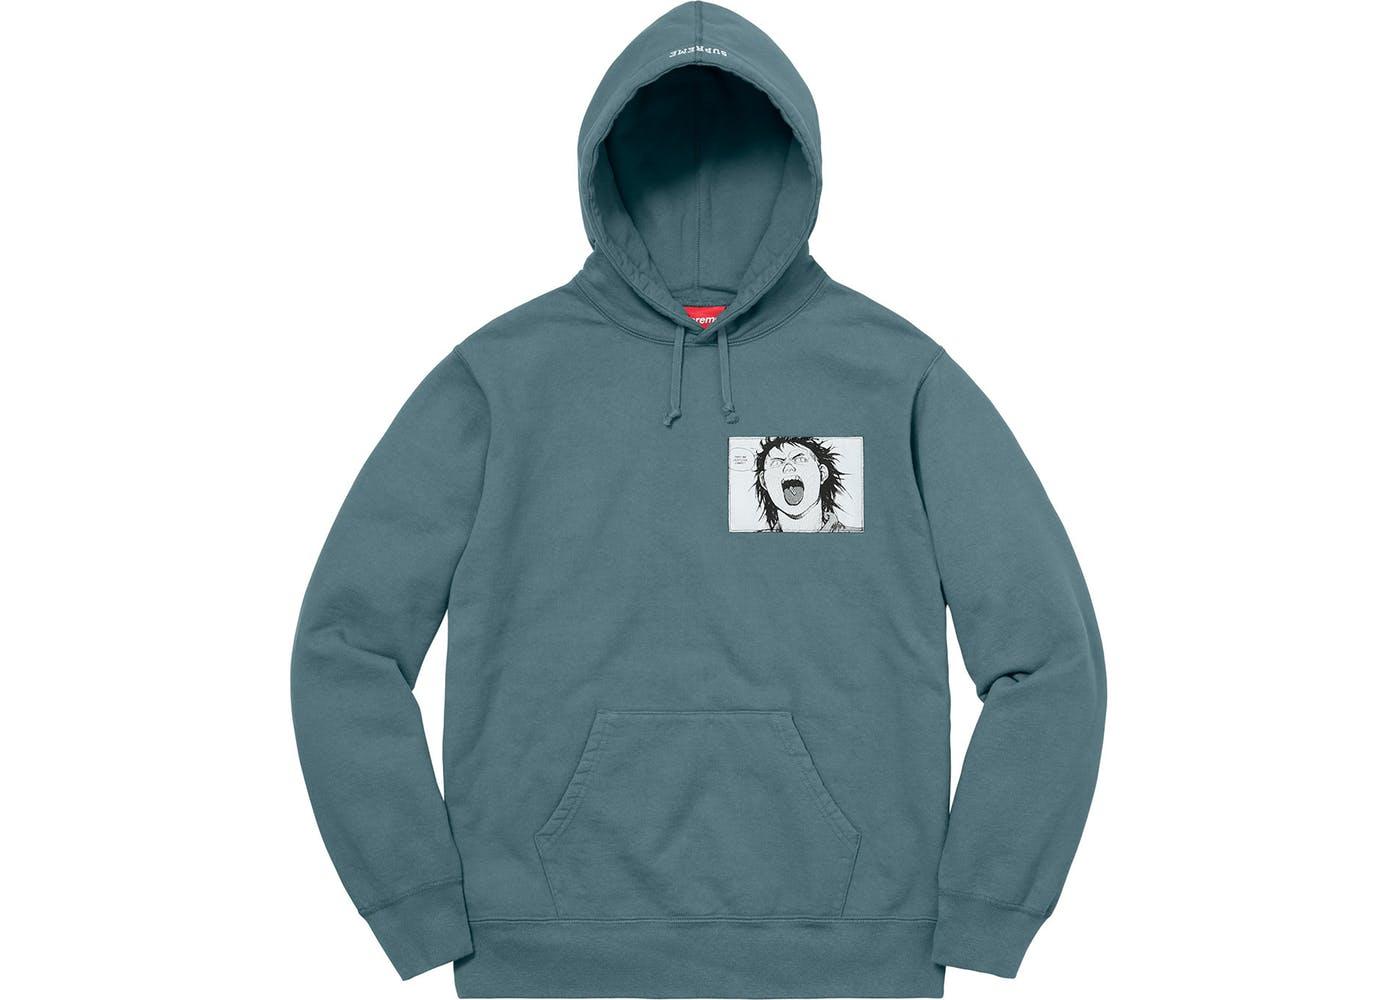 42a344b265a4 Supreme AKIRA Patches Hooded Sweatshirt Slate - StockX News